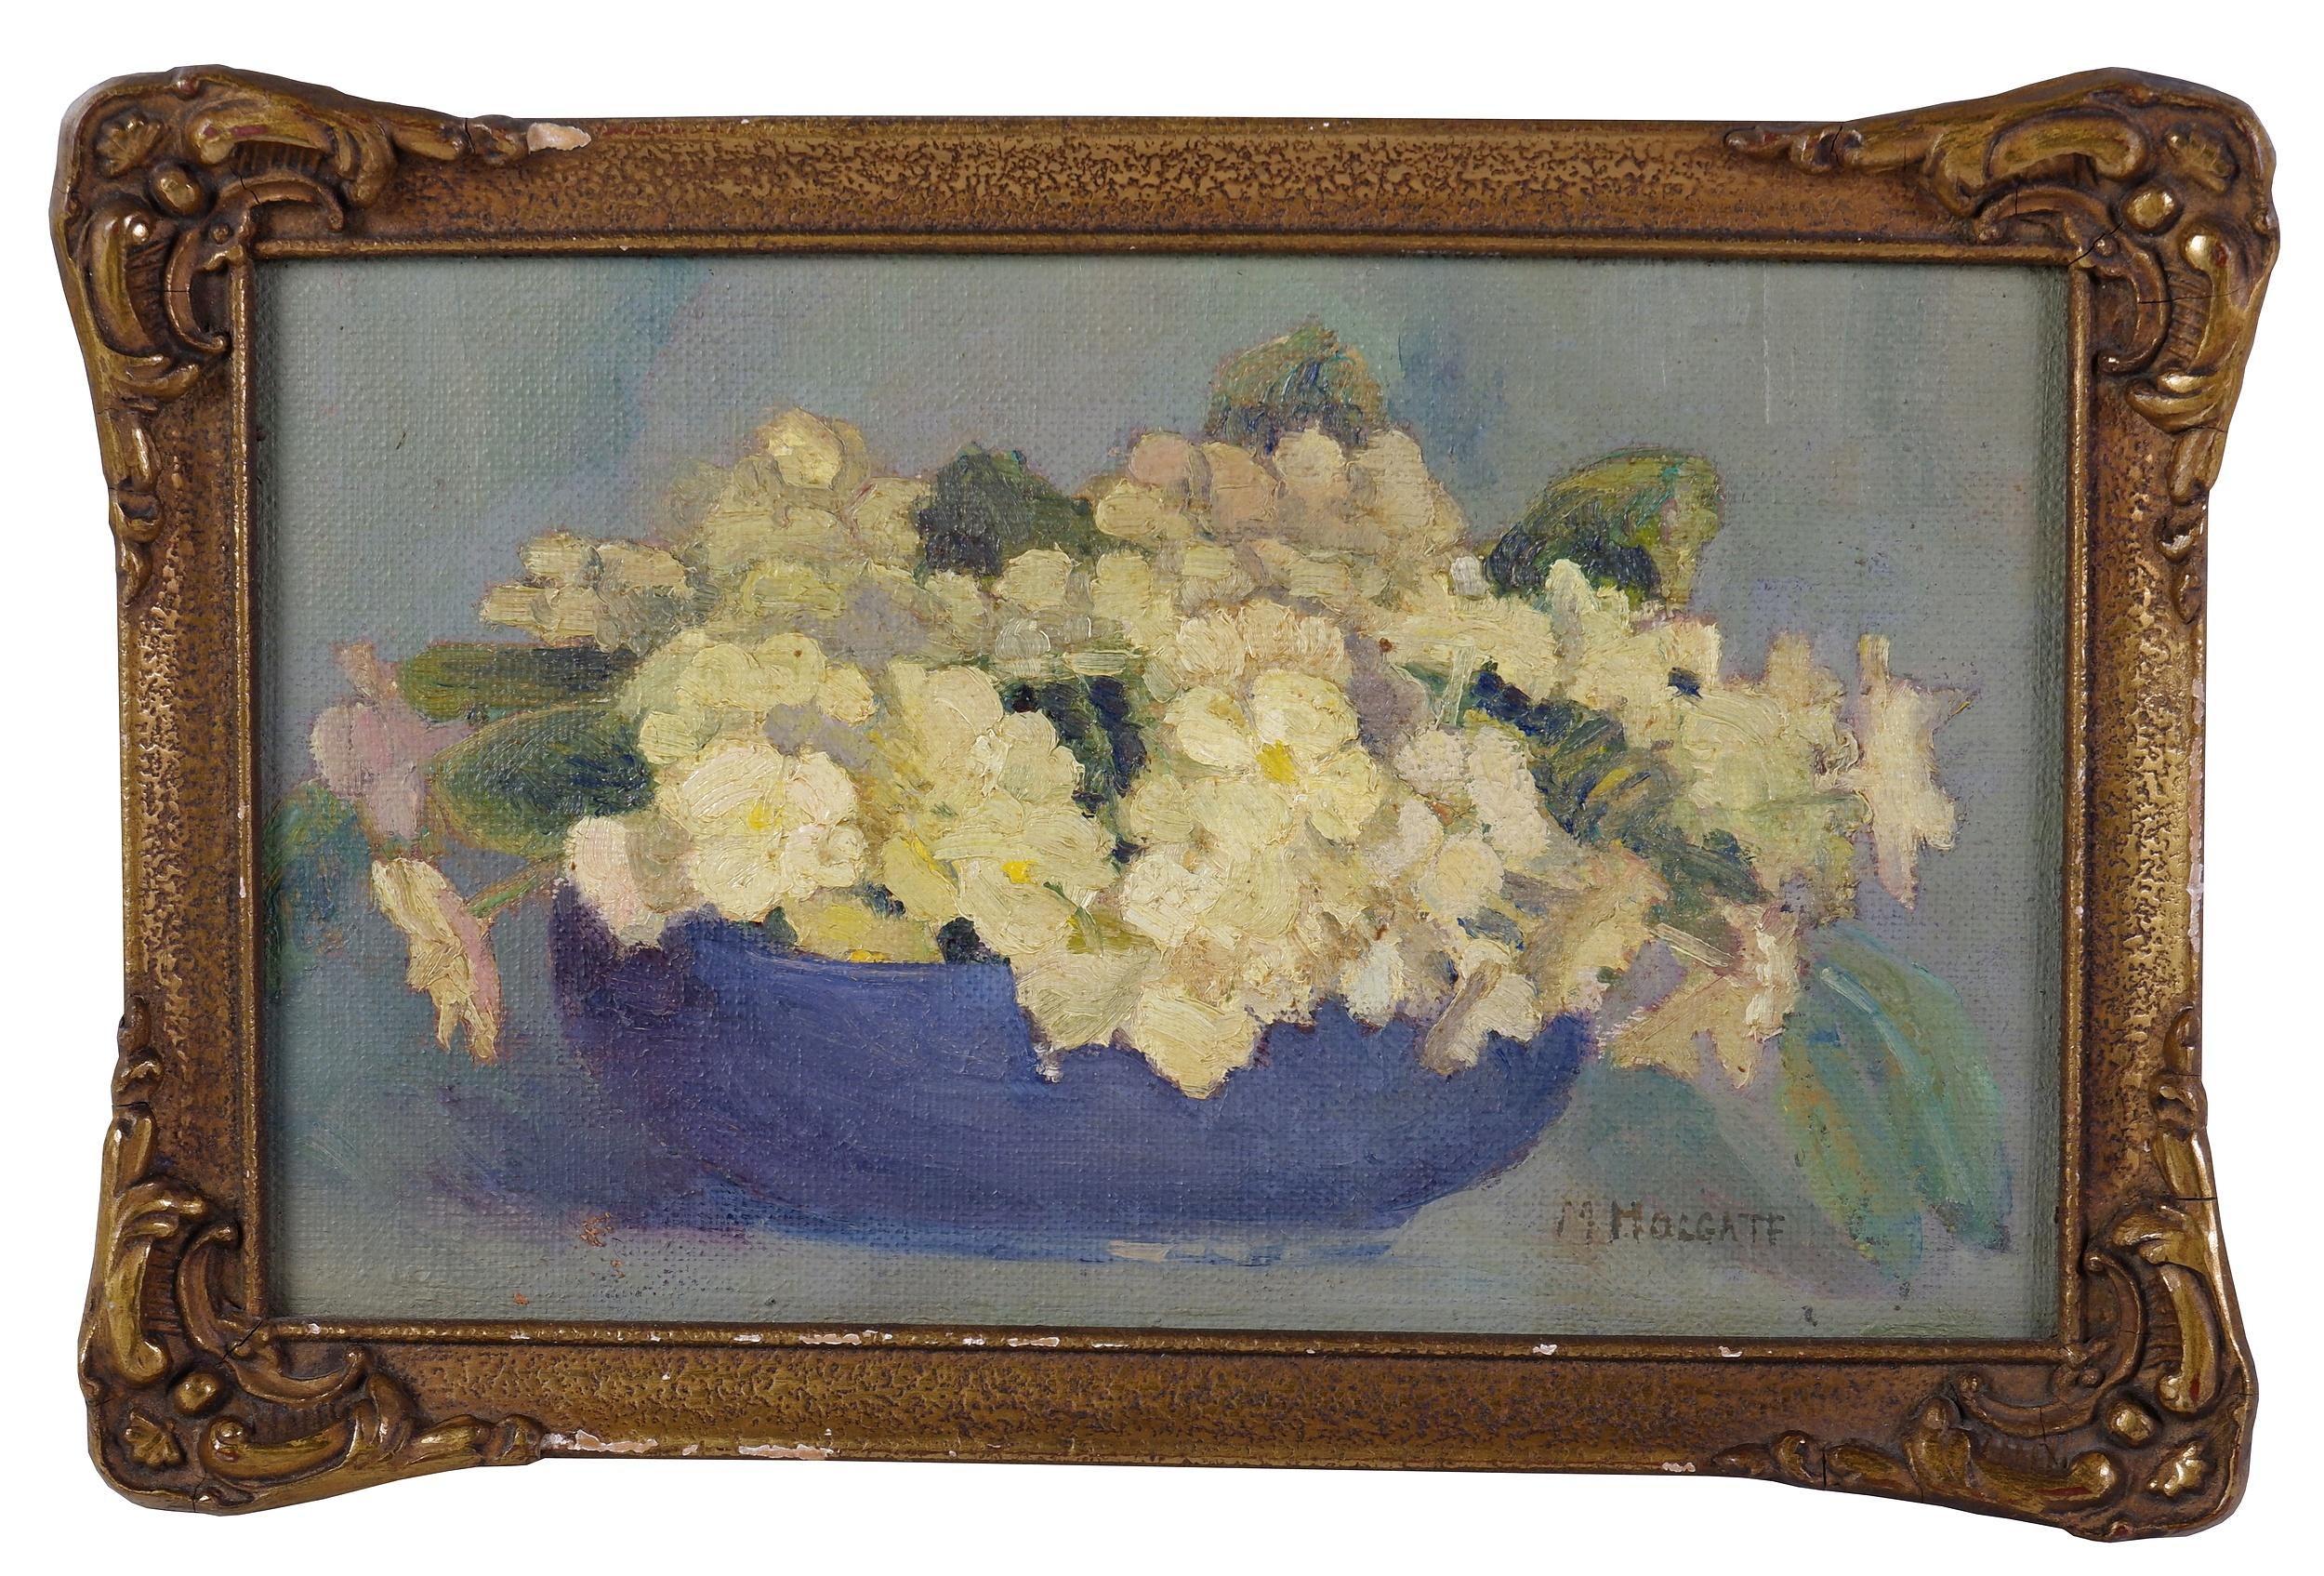 'Maria Holgate (Early 20th Century), Still Life, Oil on Canvas'